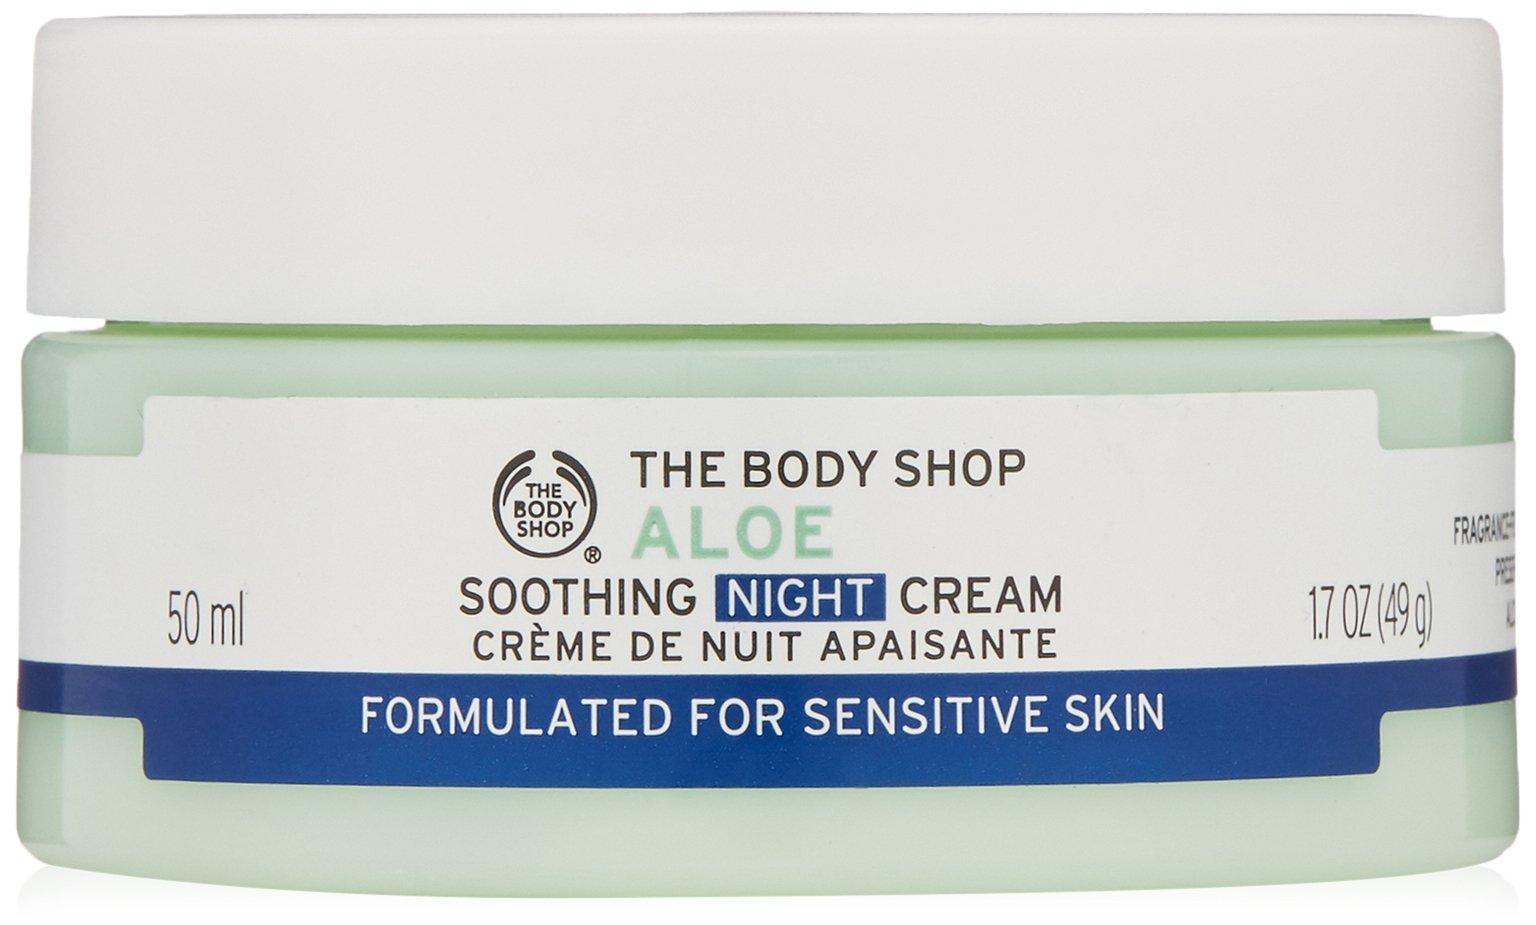 The Body Shop Aloe Soothing Night Cream, Paraben-Free Face Moisturizer, 1.7 Oz.